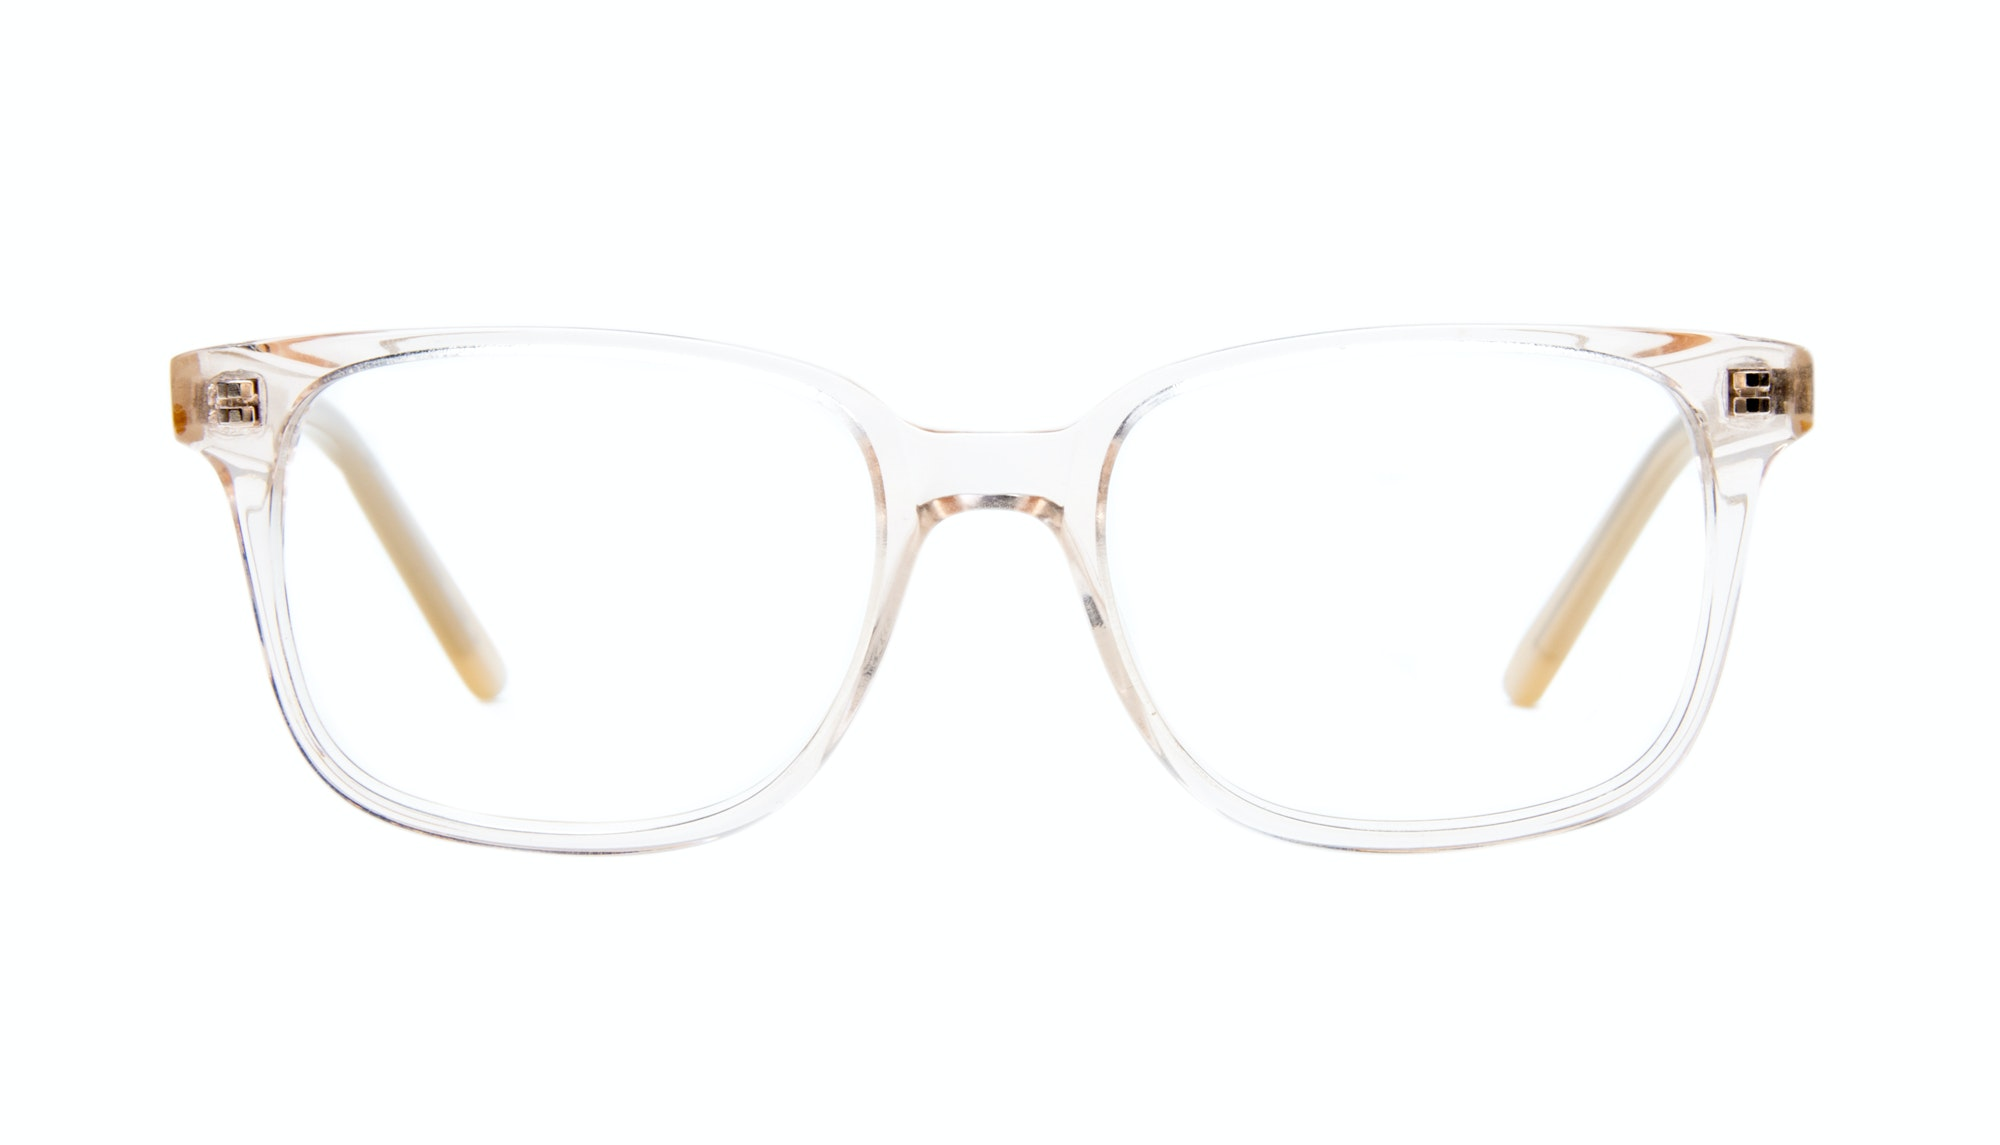 Affordable Fashion Glasses Rectangle Square Eyeglasses Women Windsor Blond Metal Front